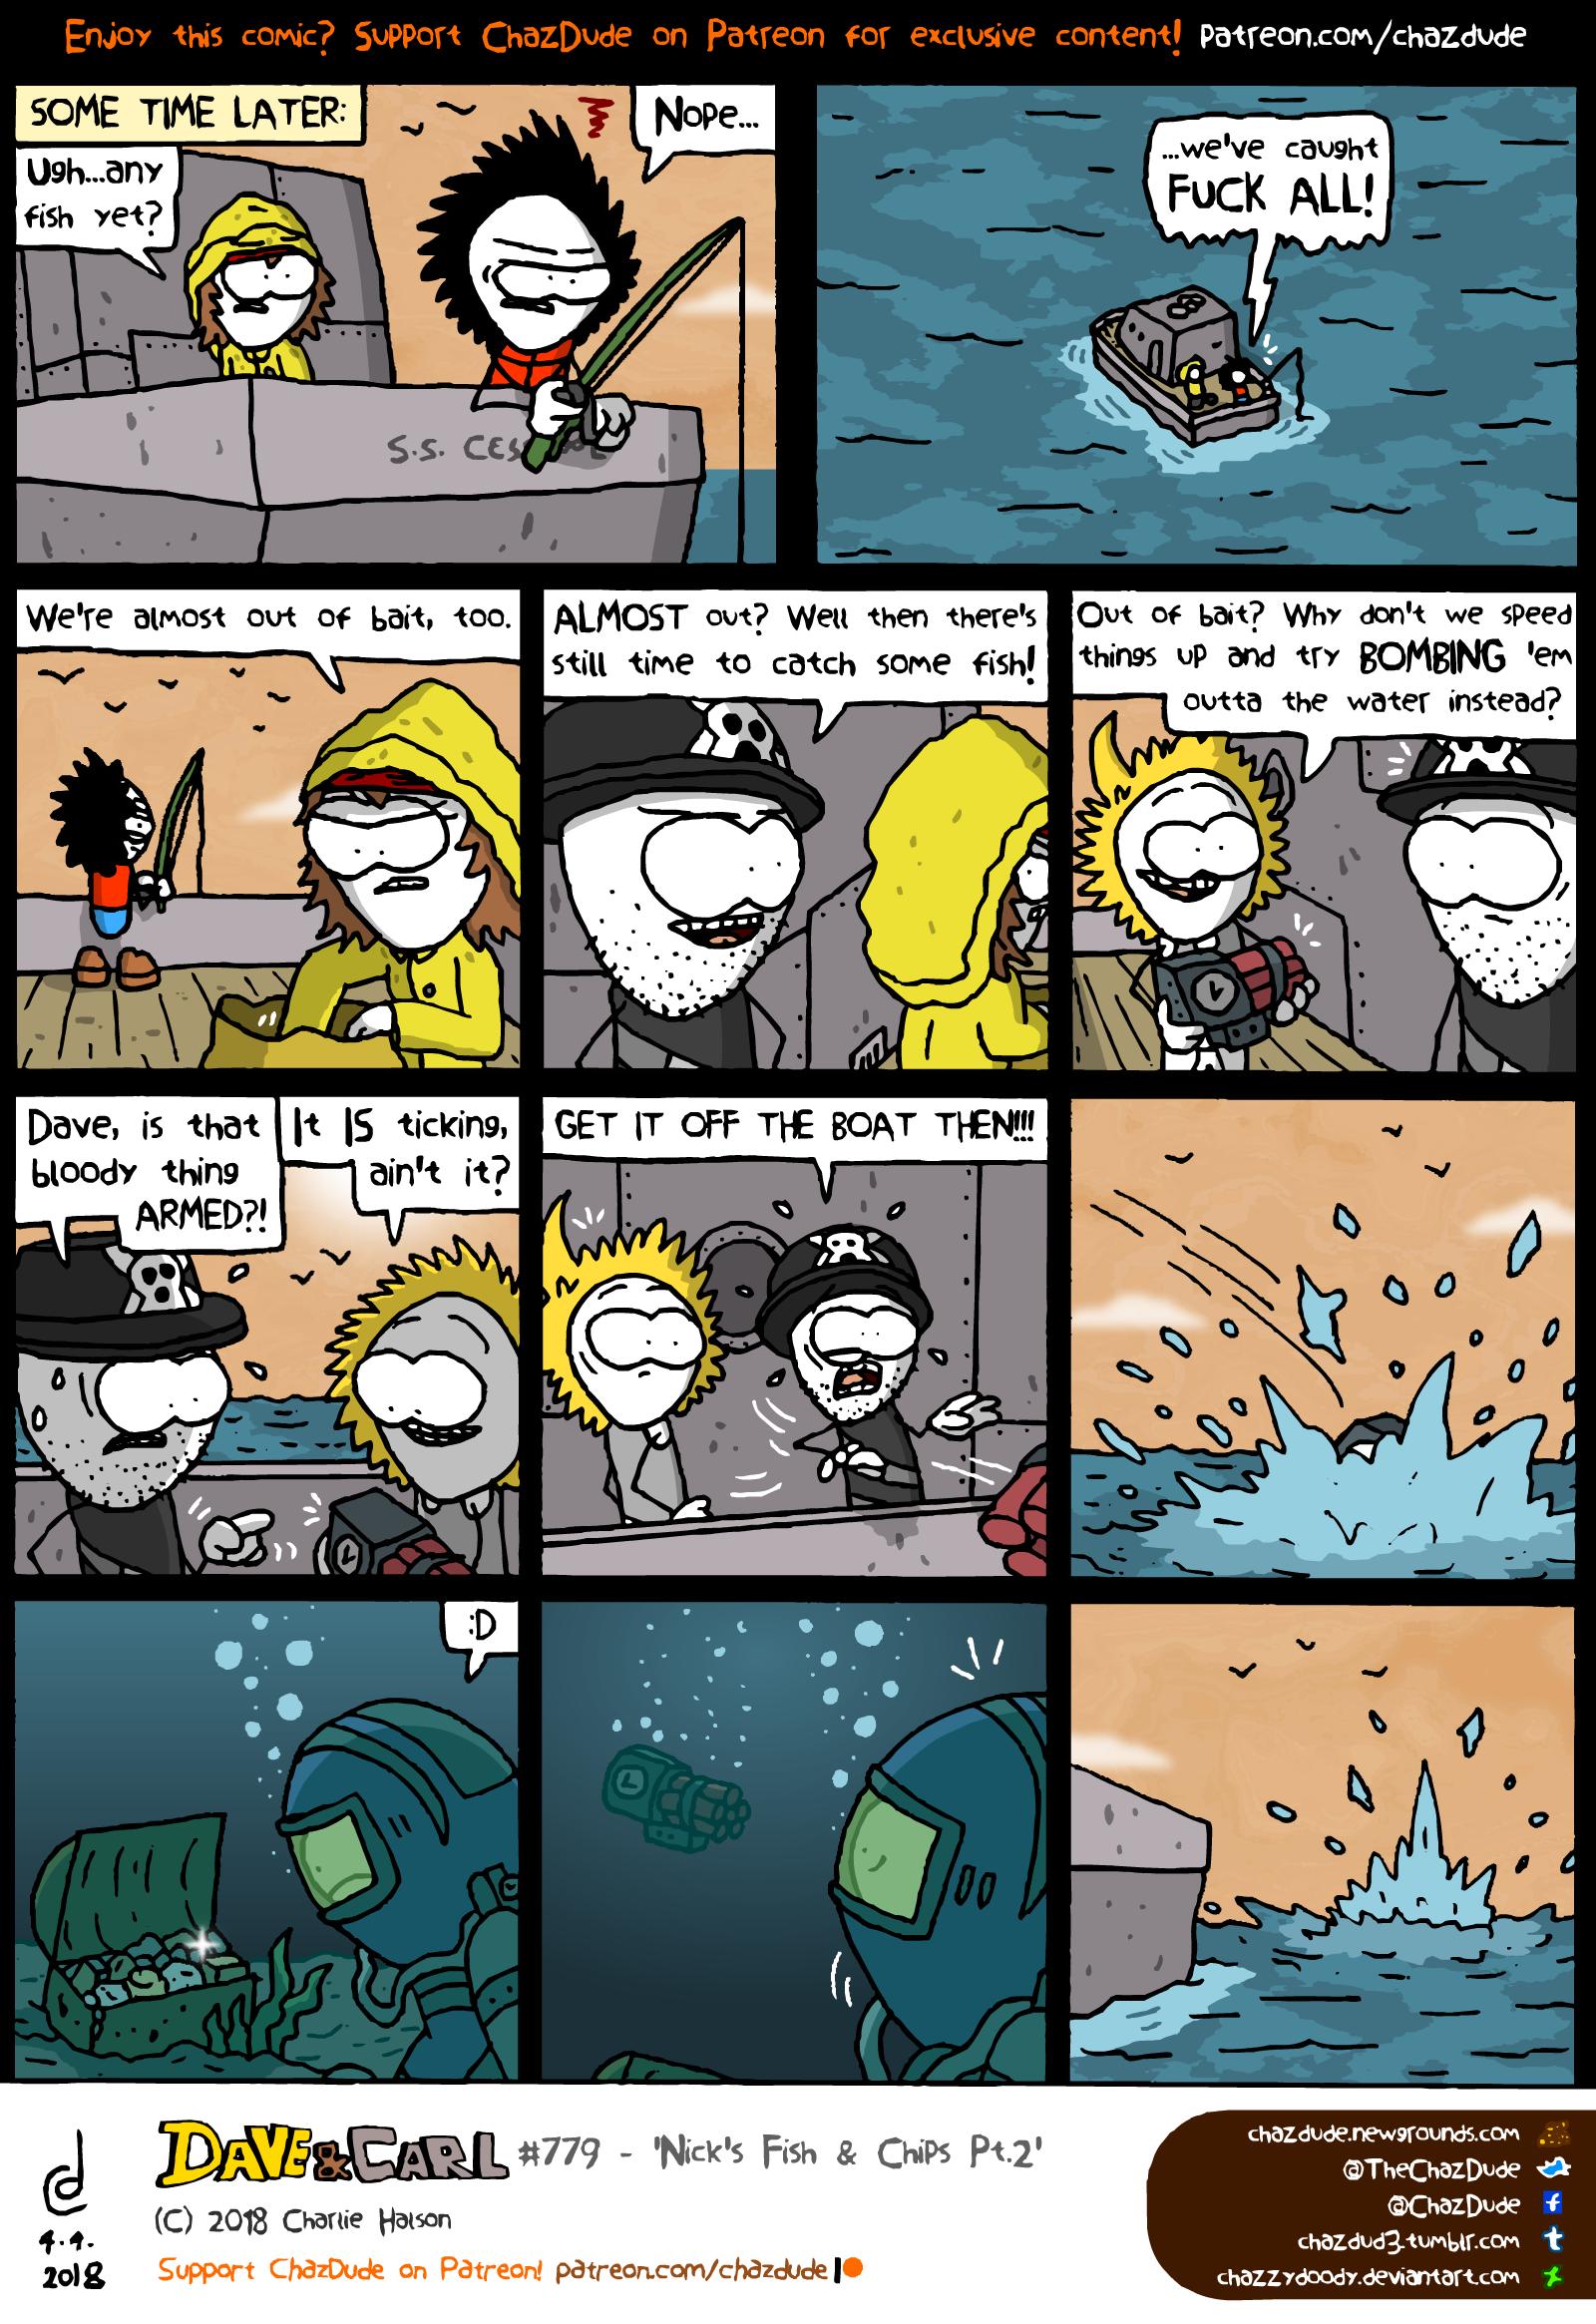 Nick's Fish & Chips Pt.2